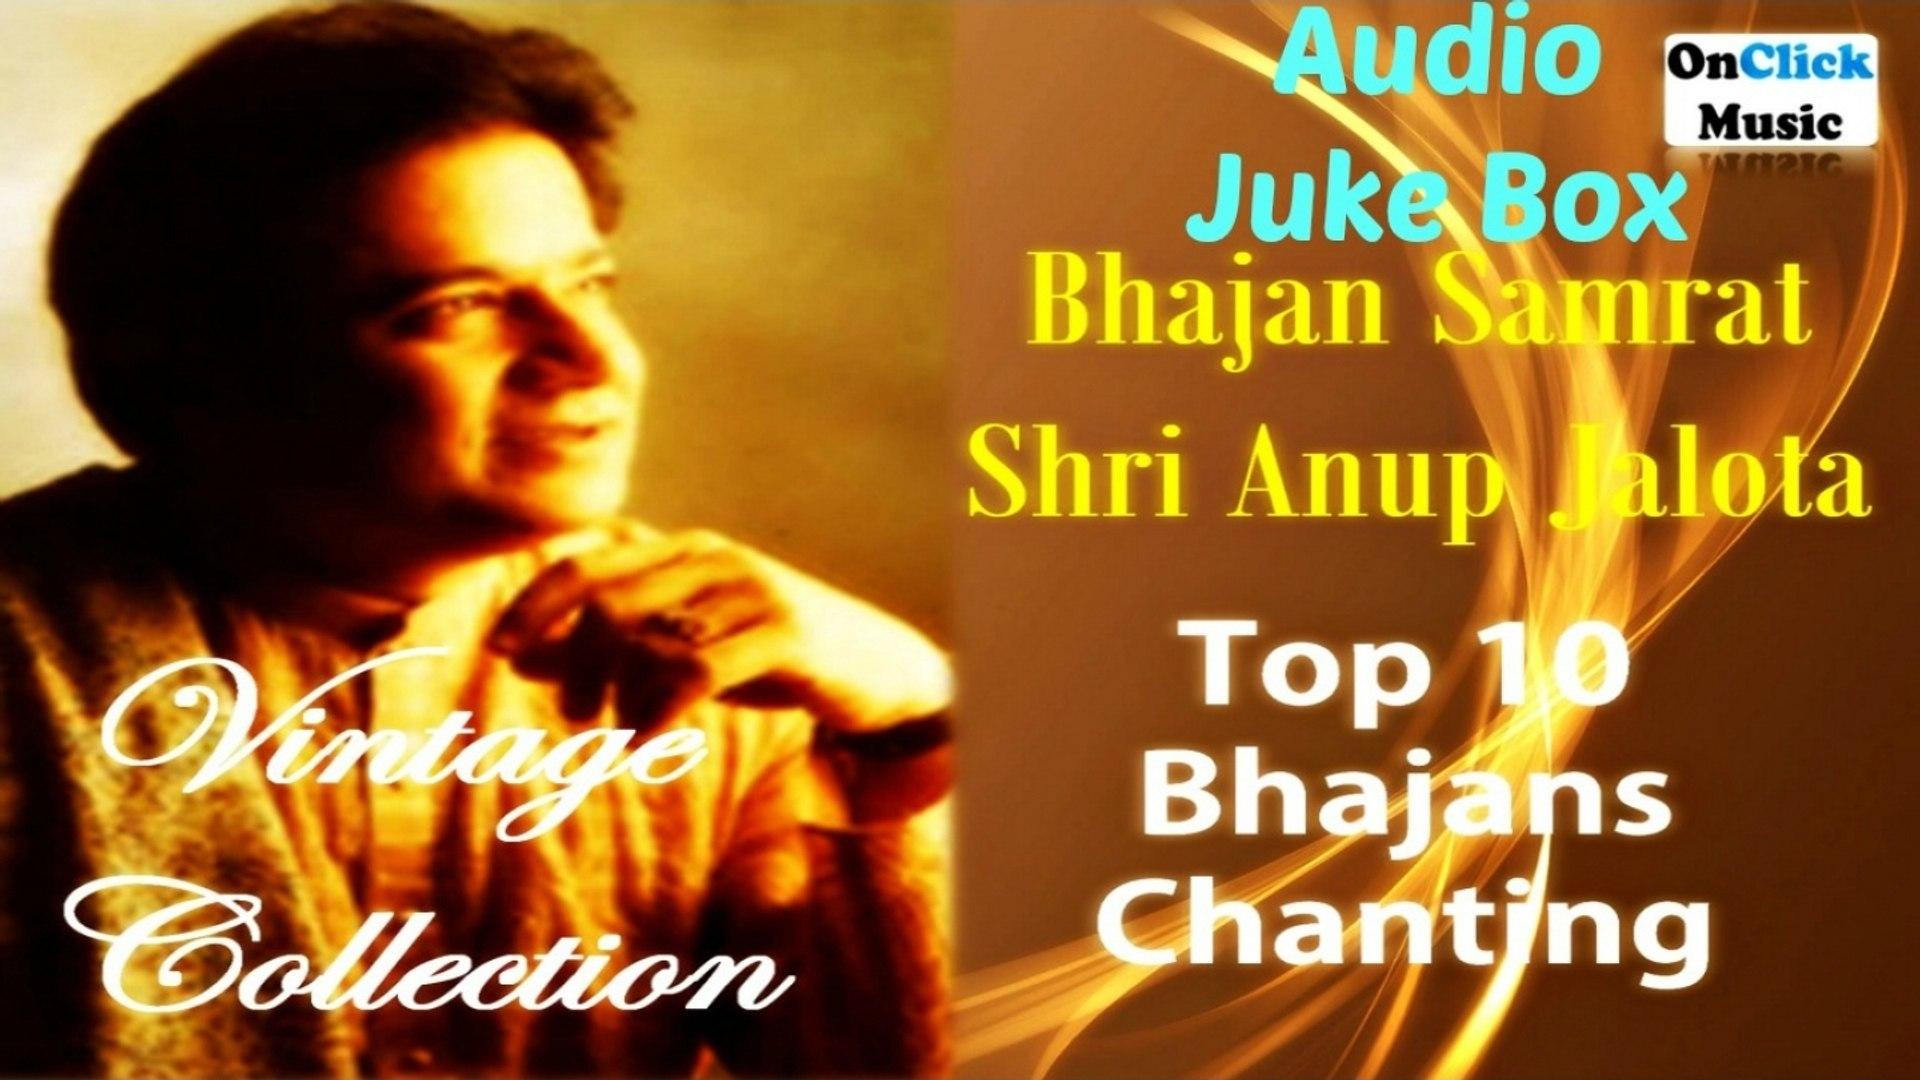 Anup Jalota - Bhajan|Audio JukeBox| Top 10 Bhajans Chanting|